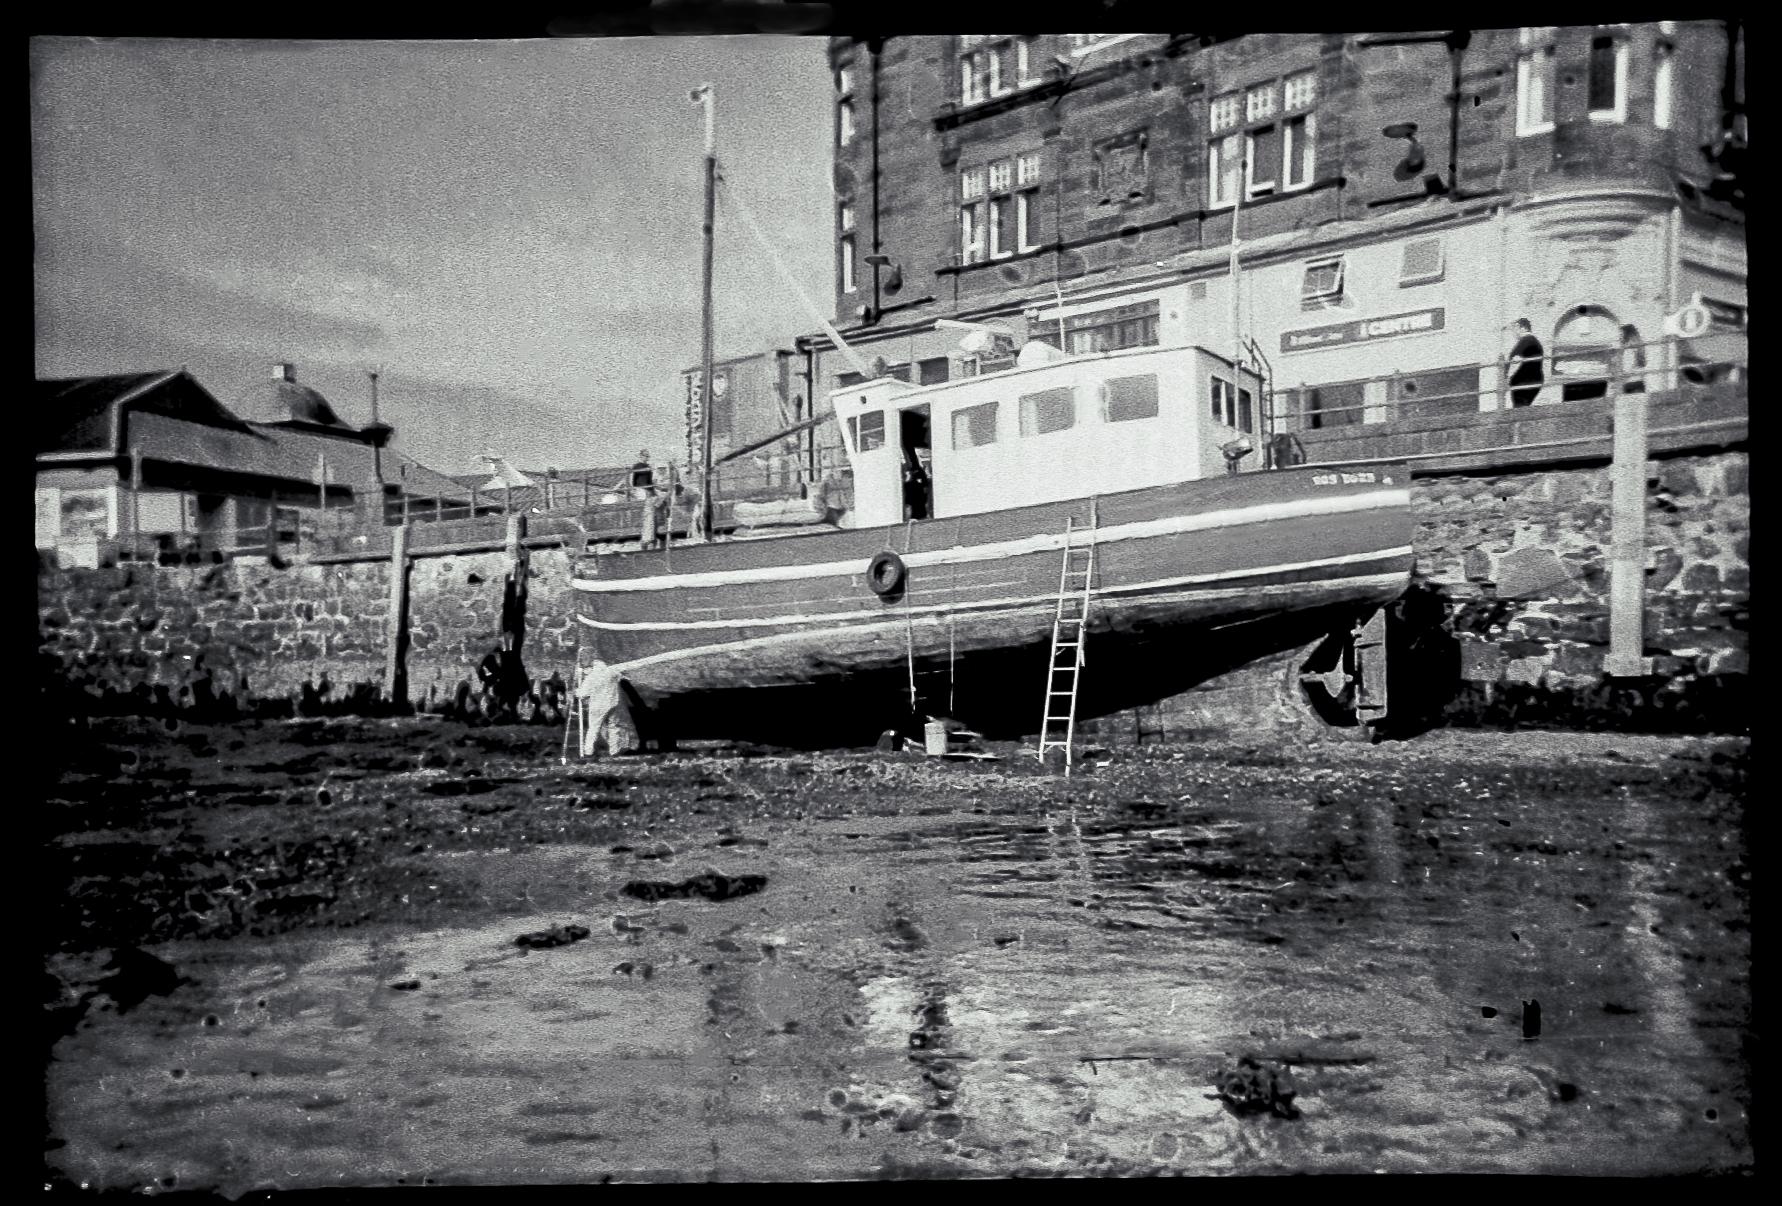 Shoot Film Photography Workshop- Oban Boat Painting